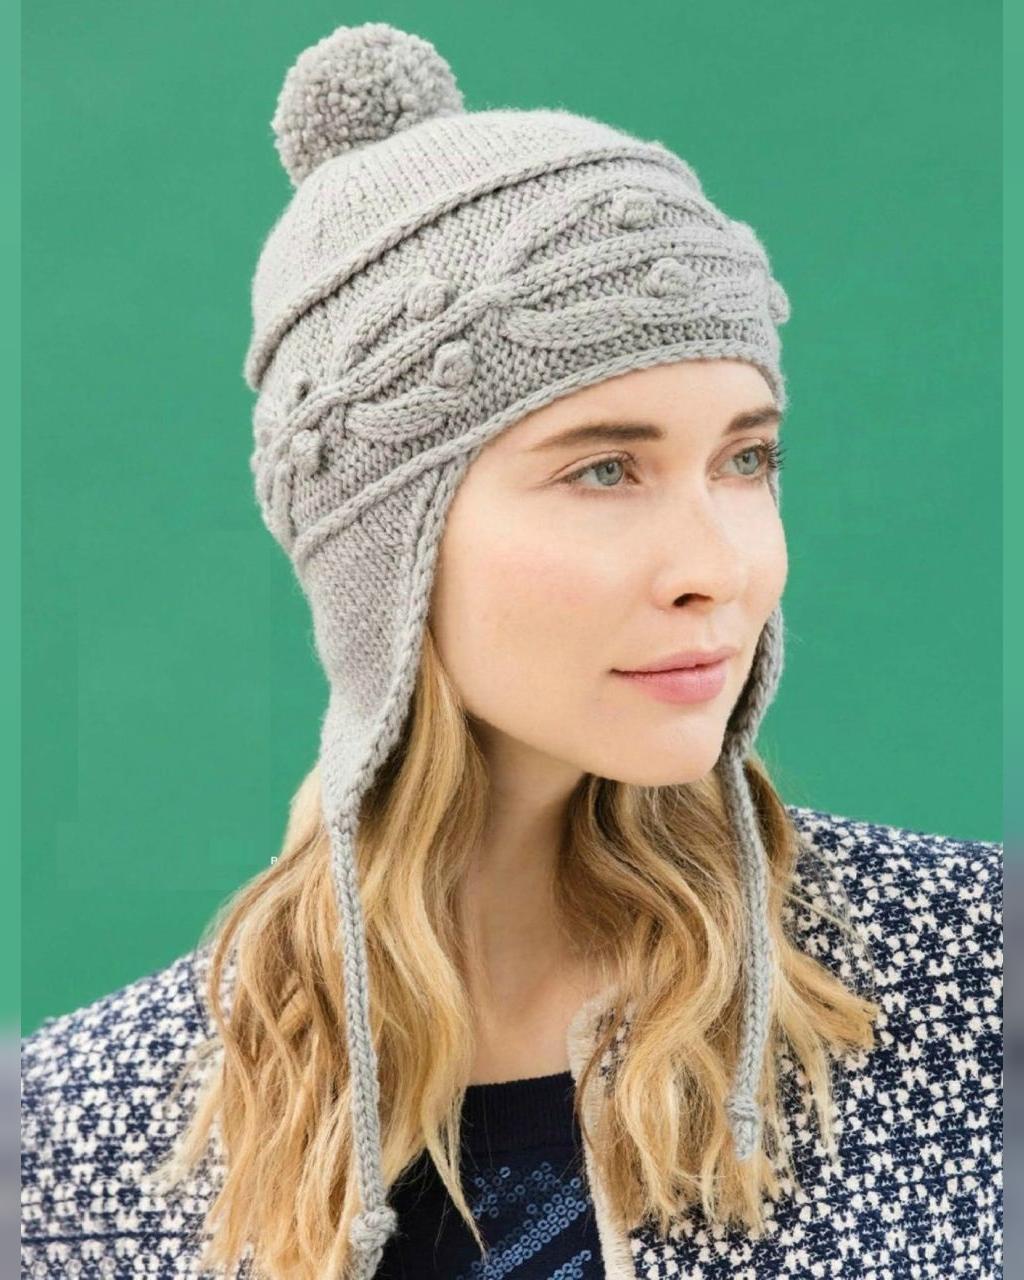 مدل کلاه بافتنی زنانه اسپرت